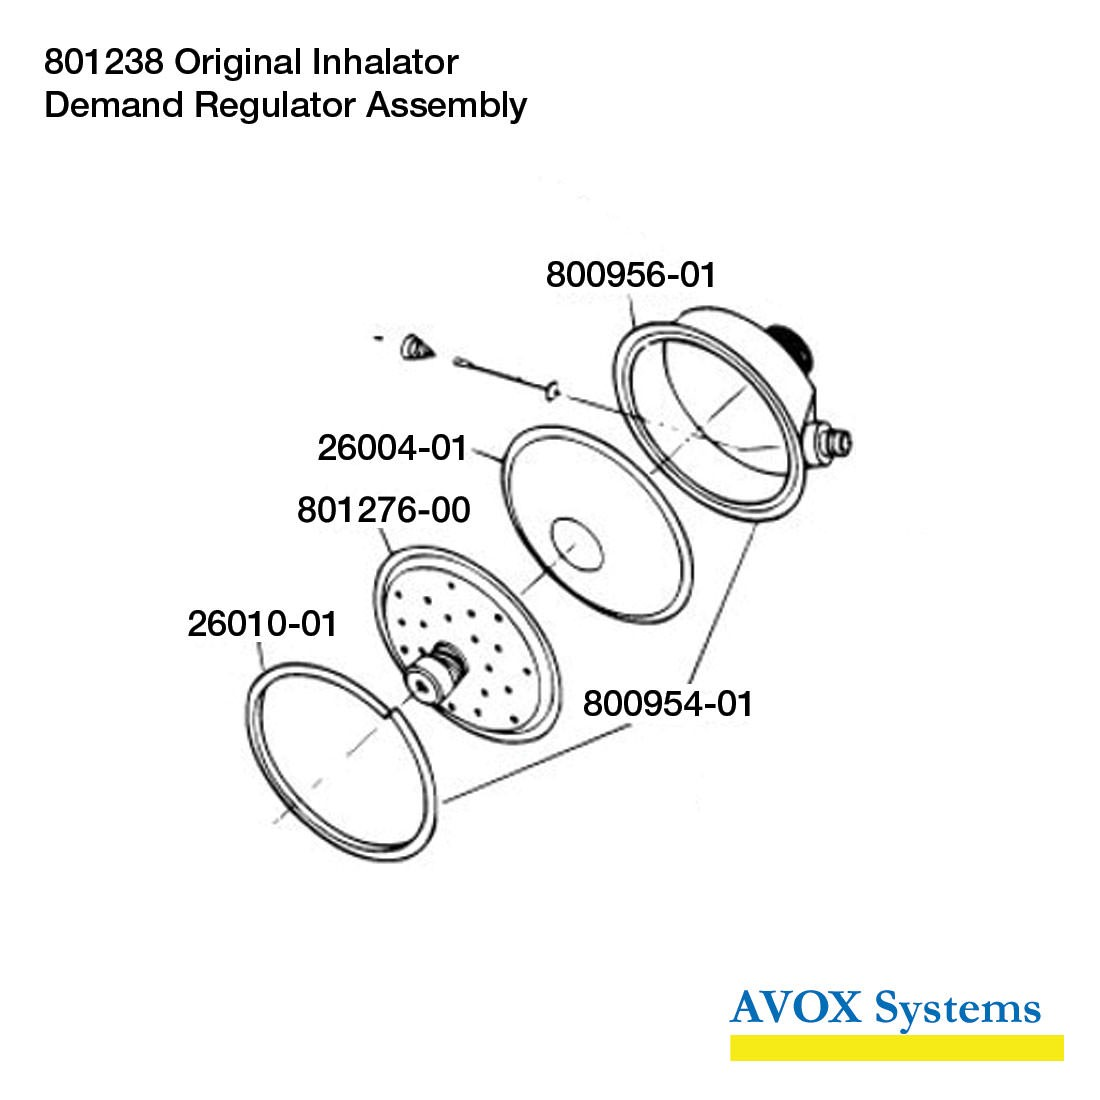 Avox 801238-01 Original Inhalator without 1st Stage Regulator Assembly without Microphone Assembly - Demand Regulator Assembly